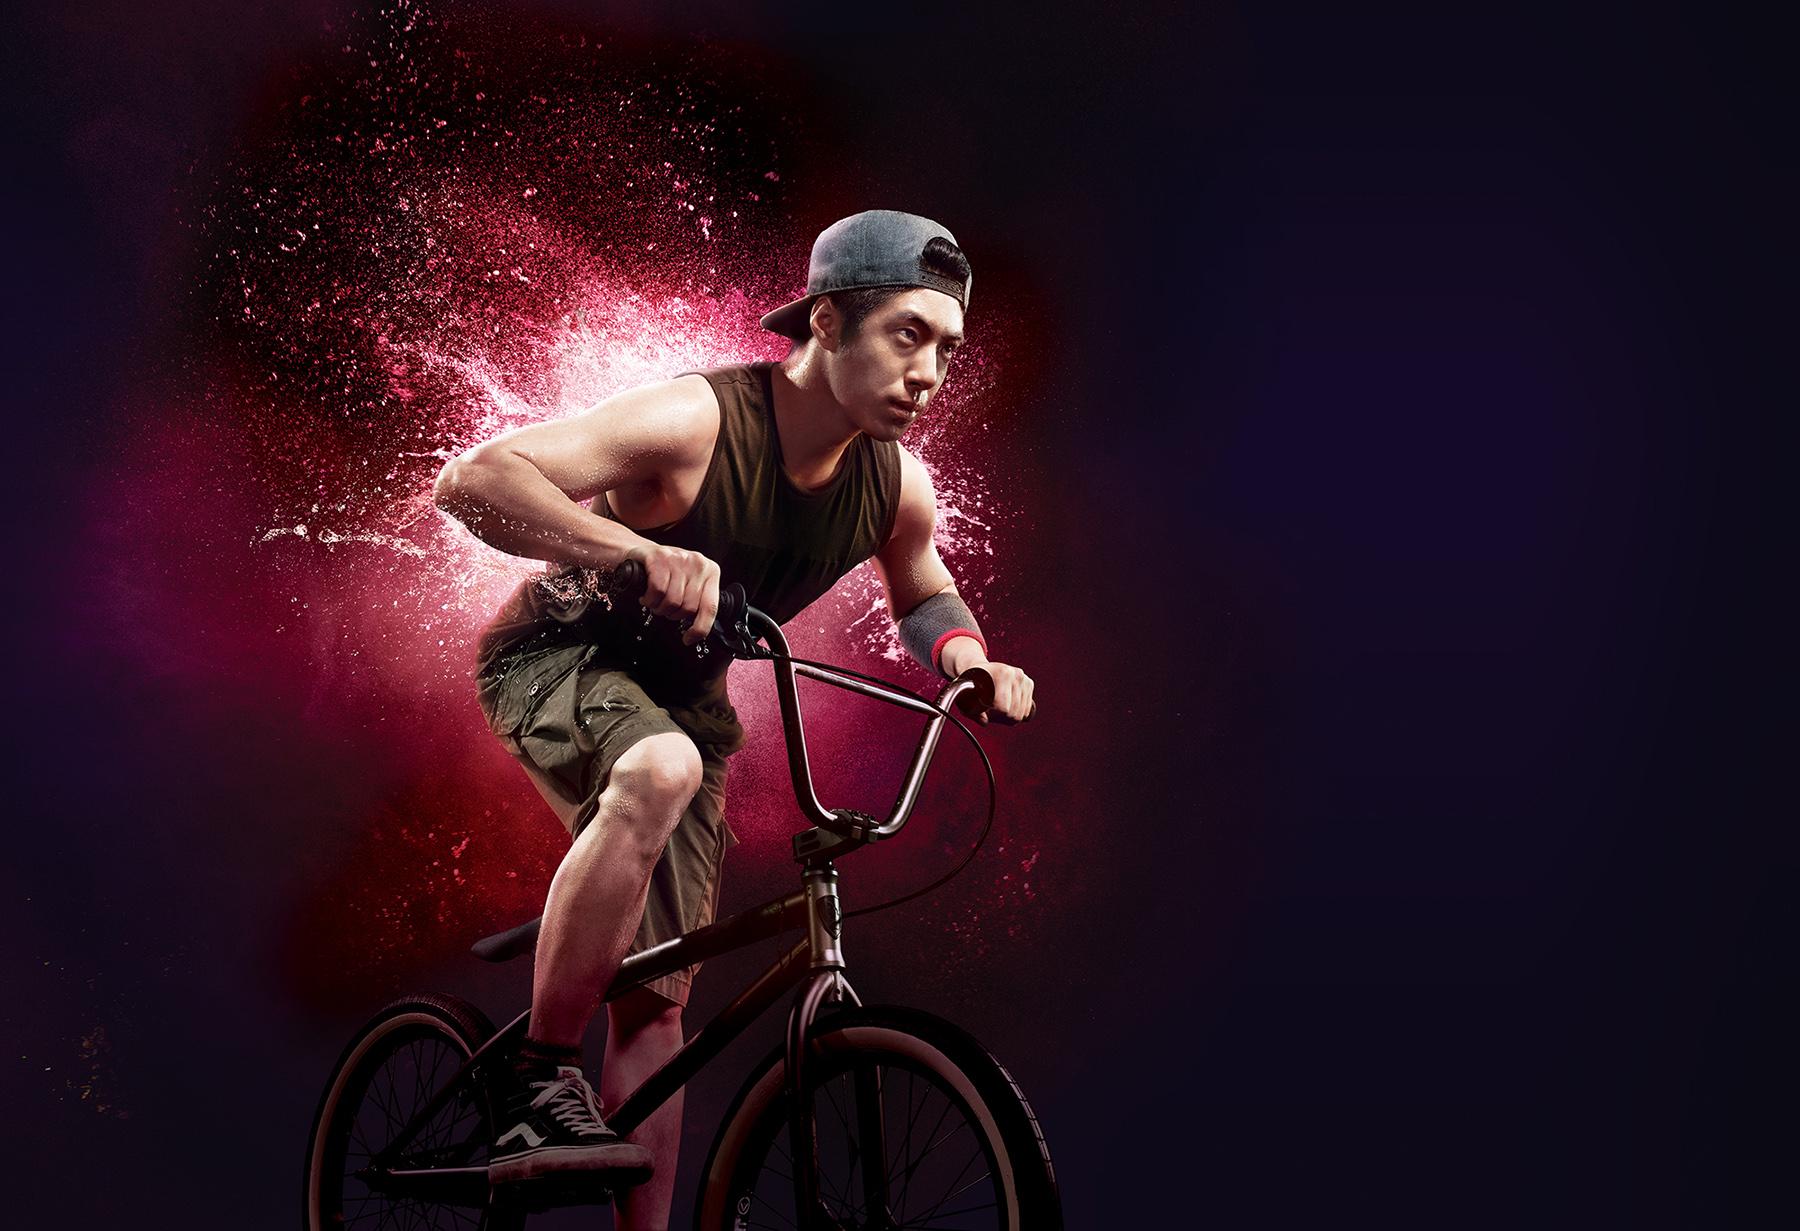 Mizone Pro_Biker